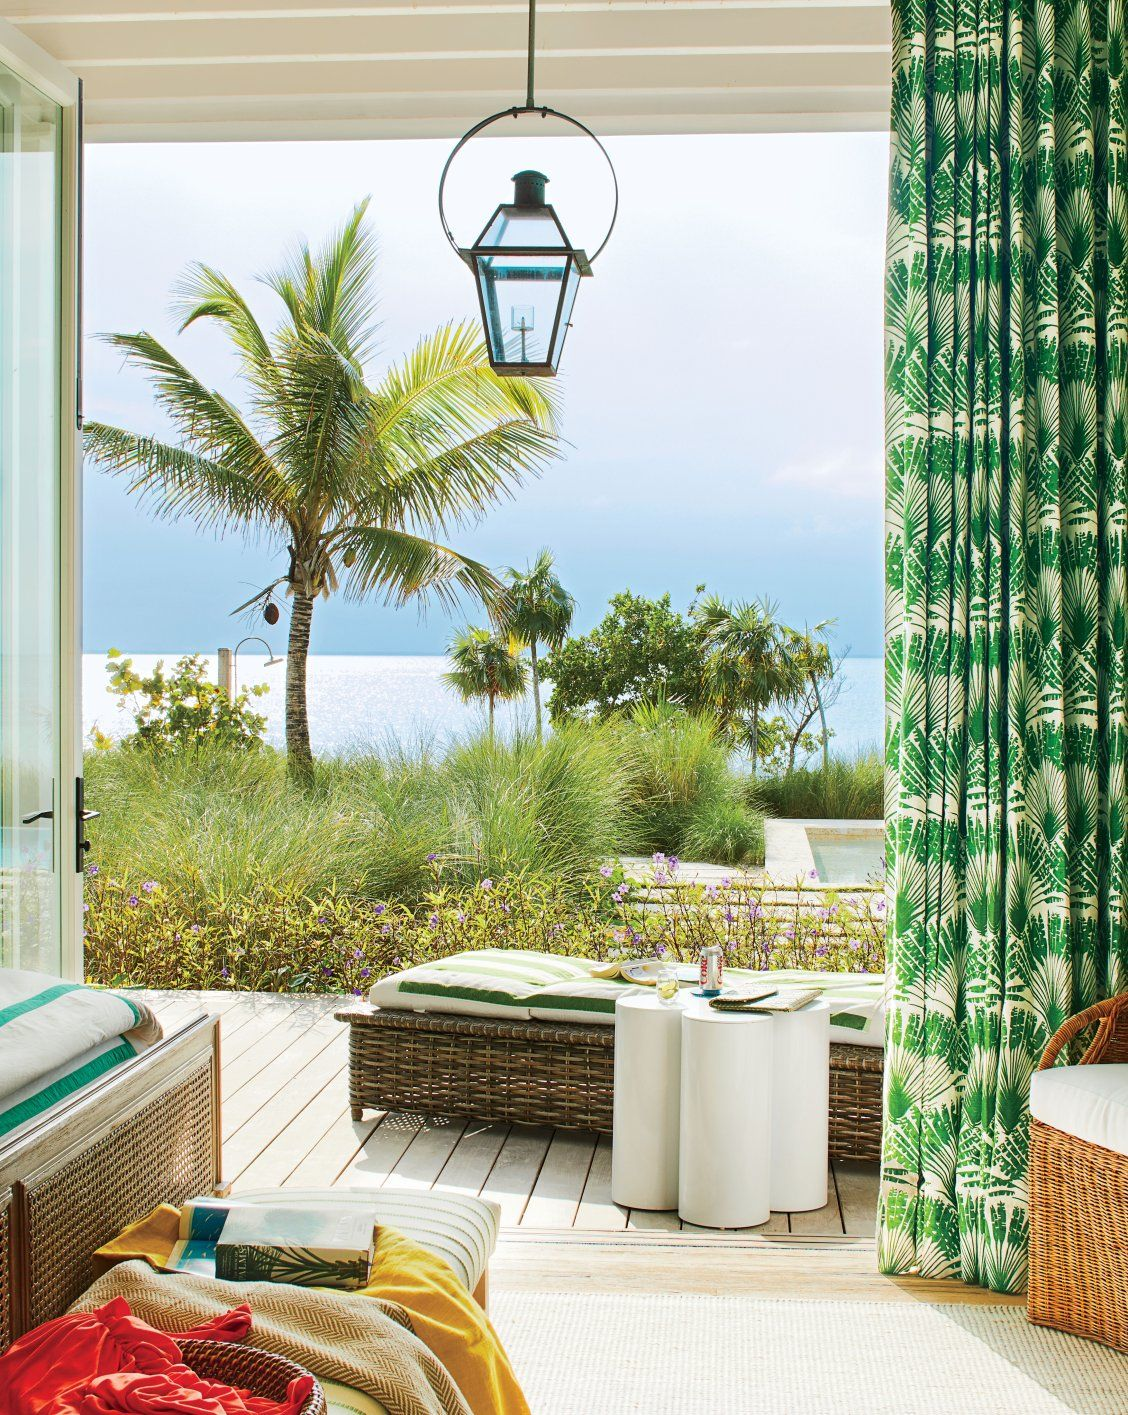 Tour the Bahamas Beach House of Your